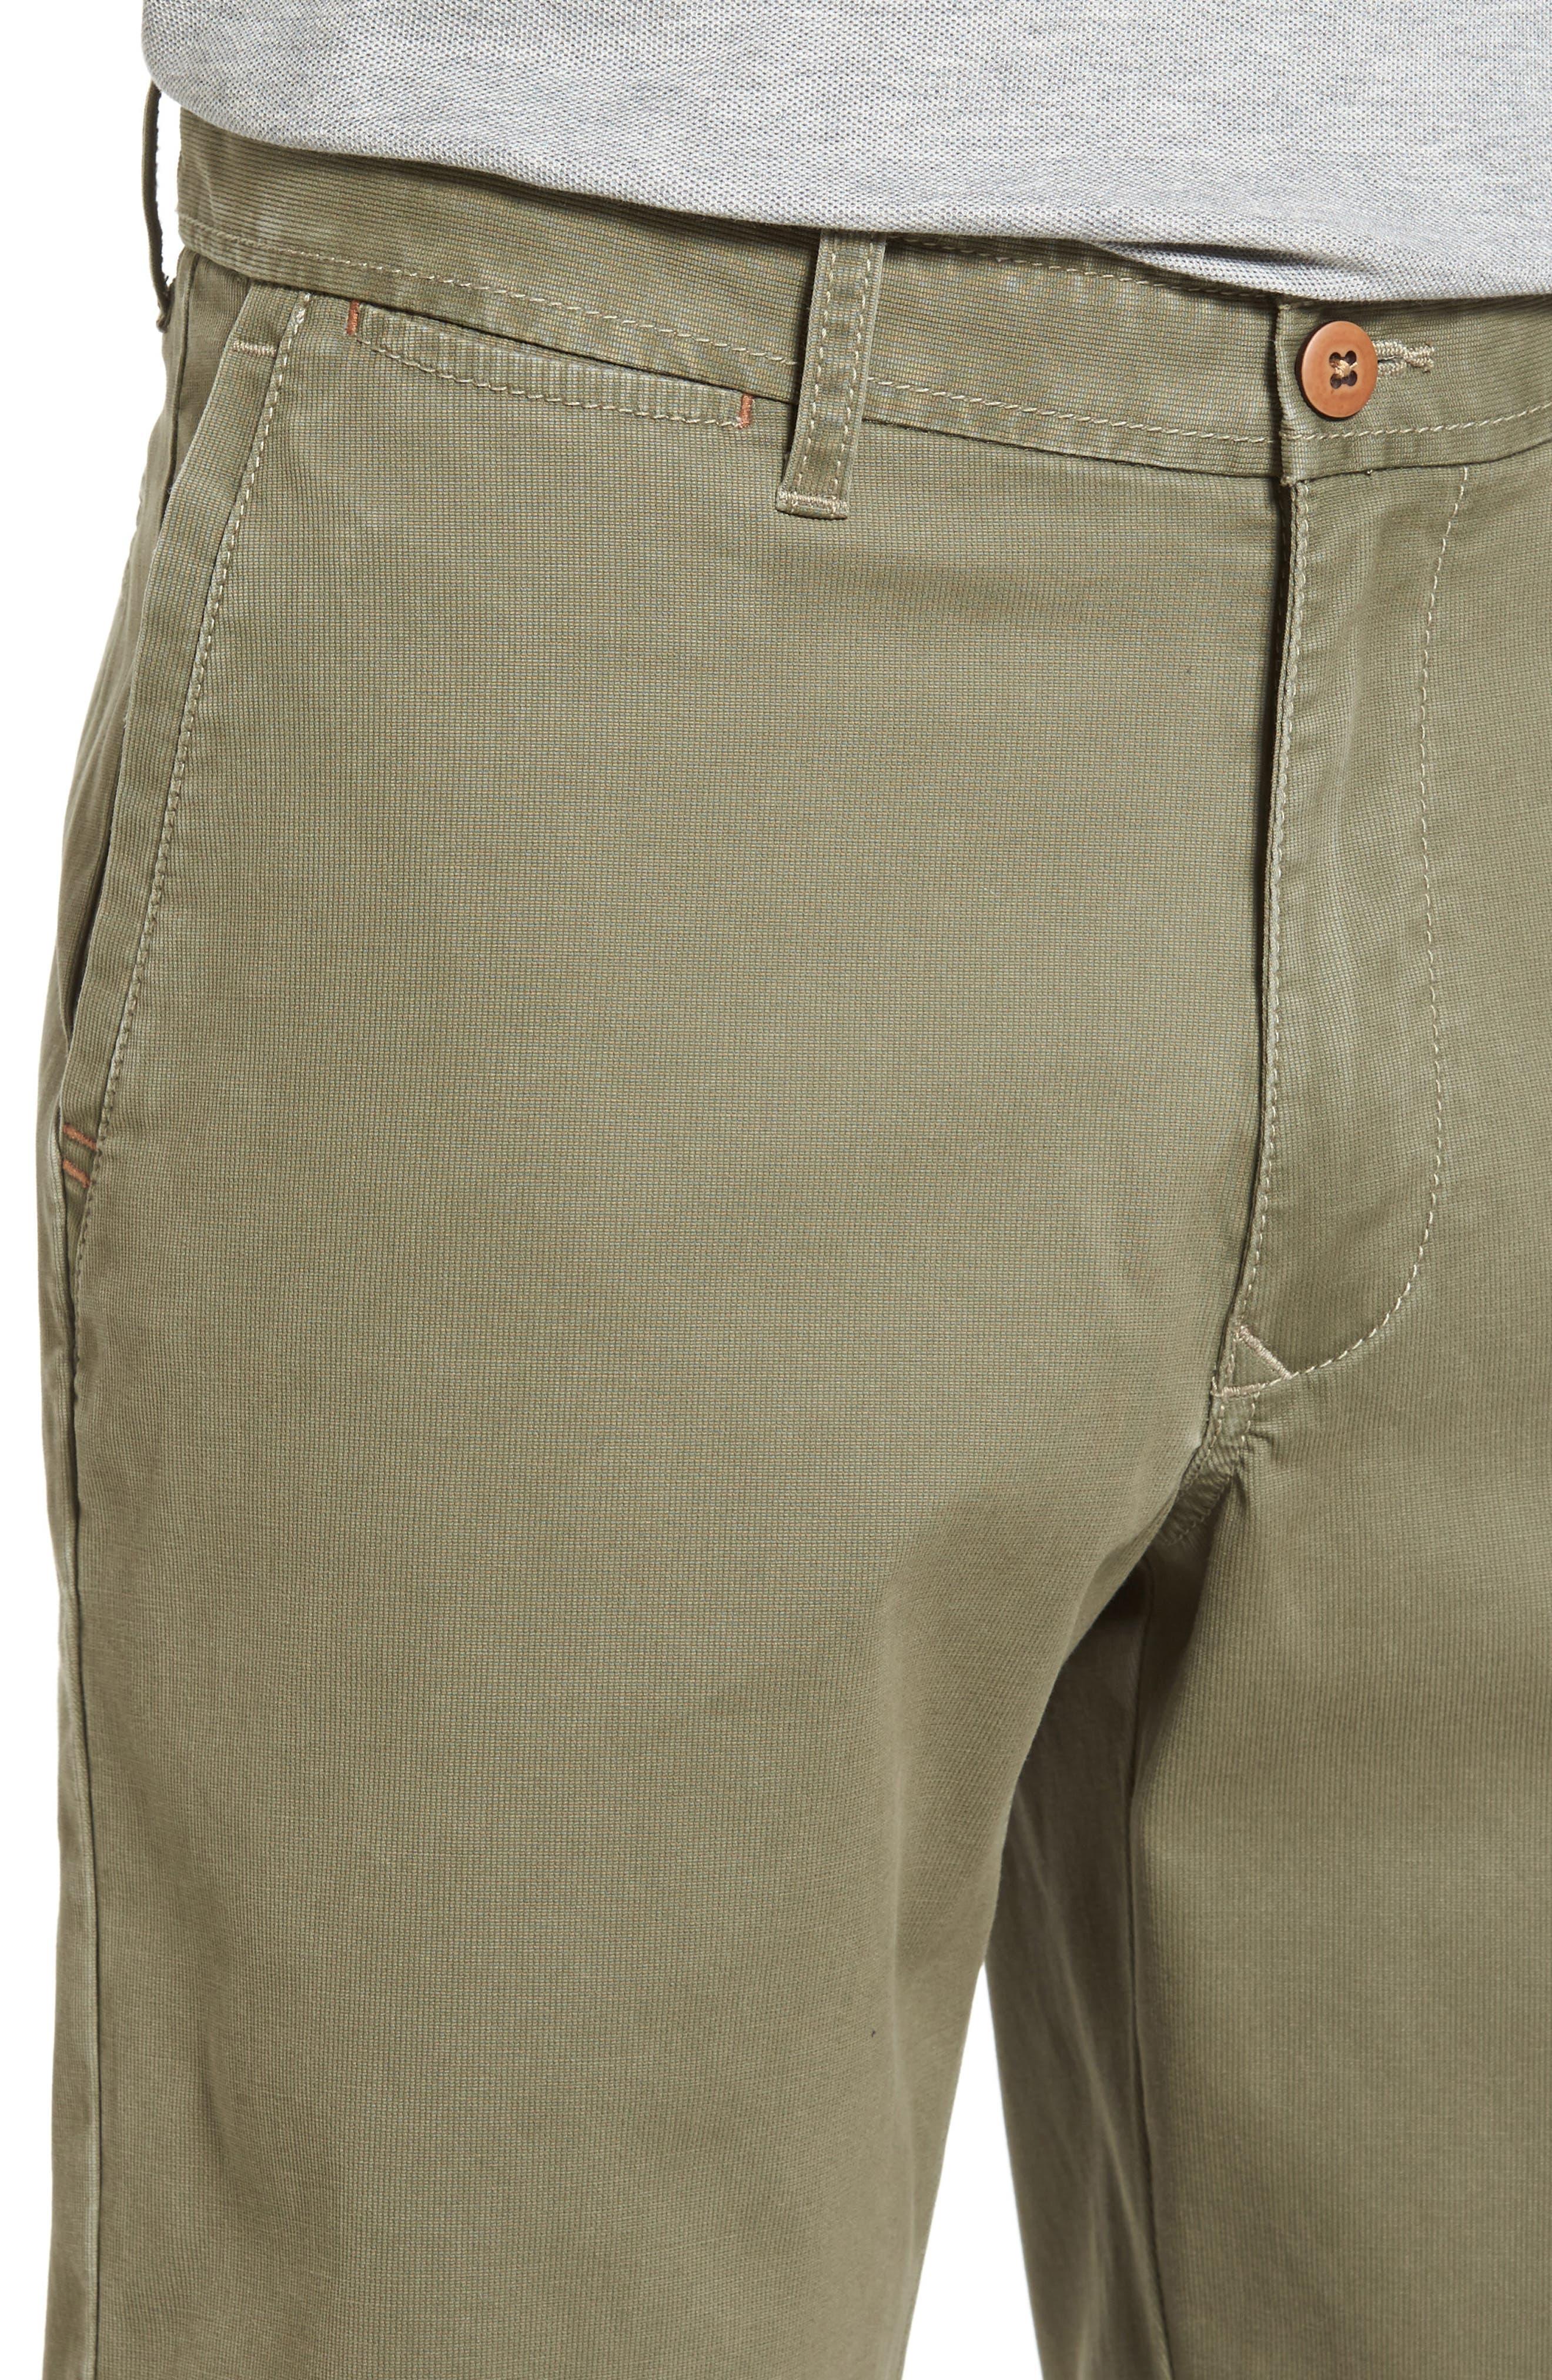 'Bedford & Sons' Shorts,                             Alternate thumbnail 39, color,